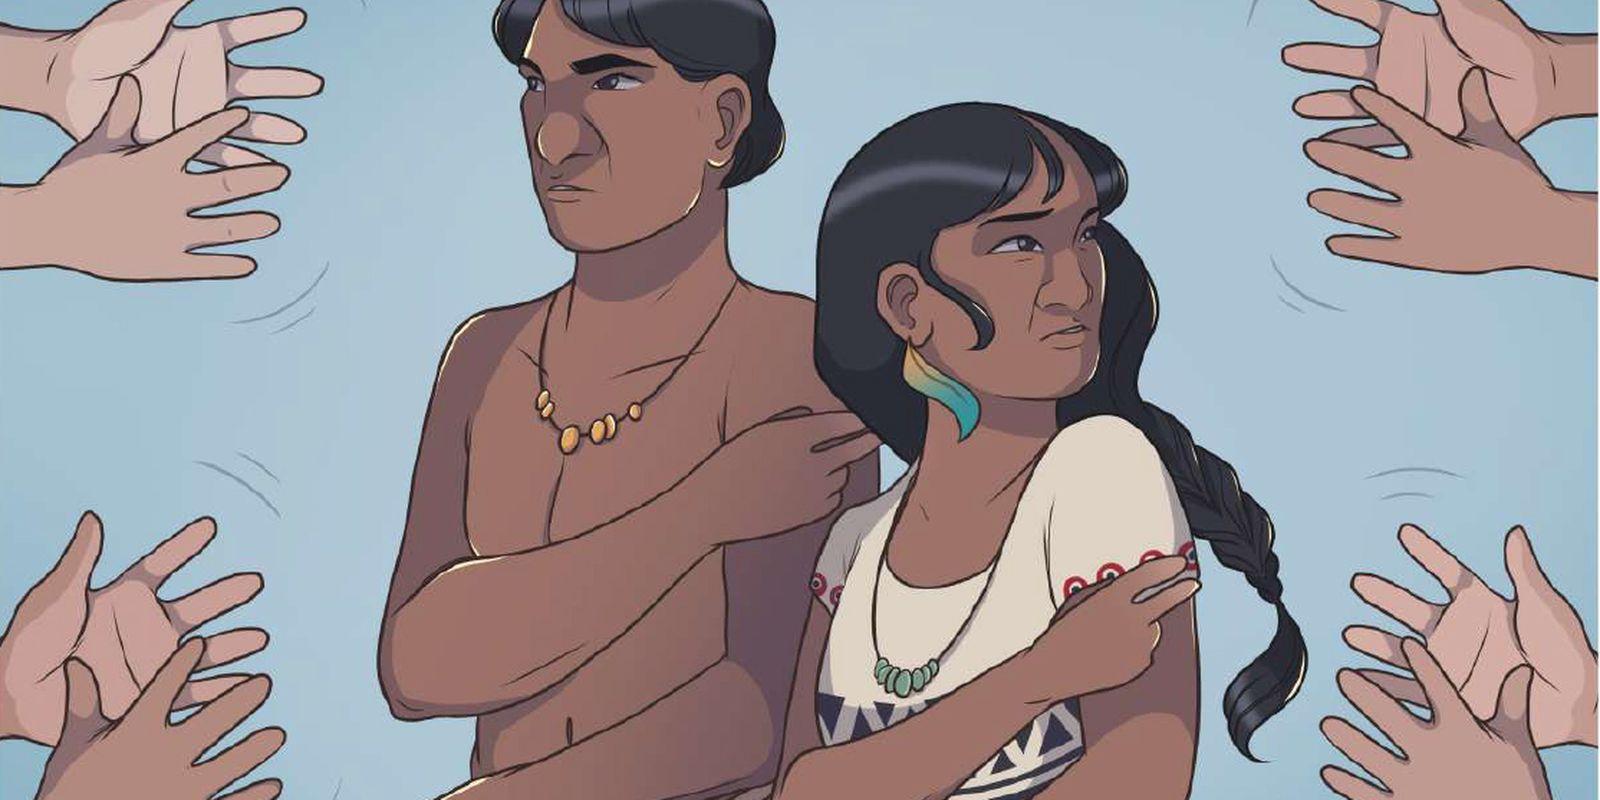 HQ Língua Indígena de Sinais